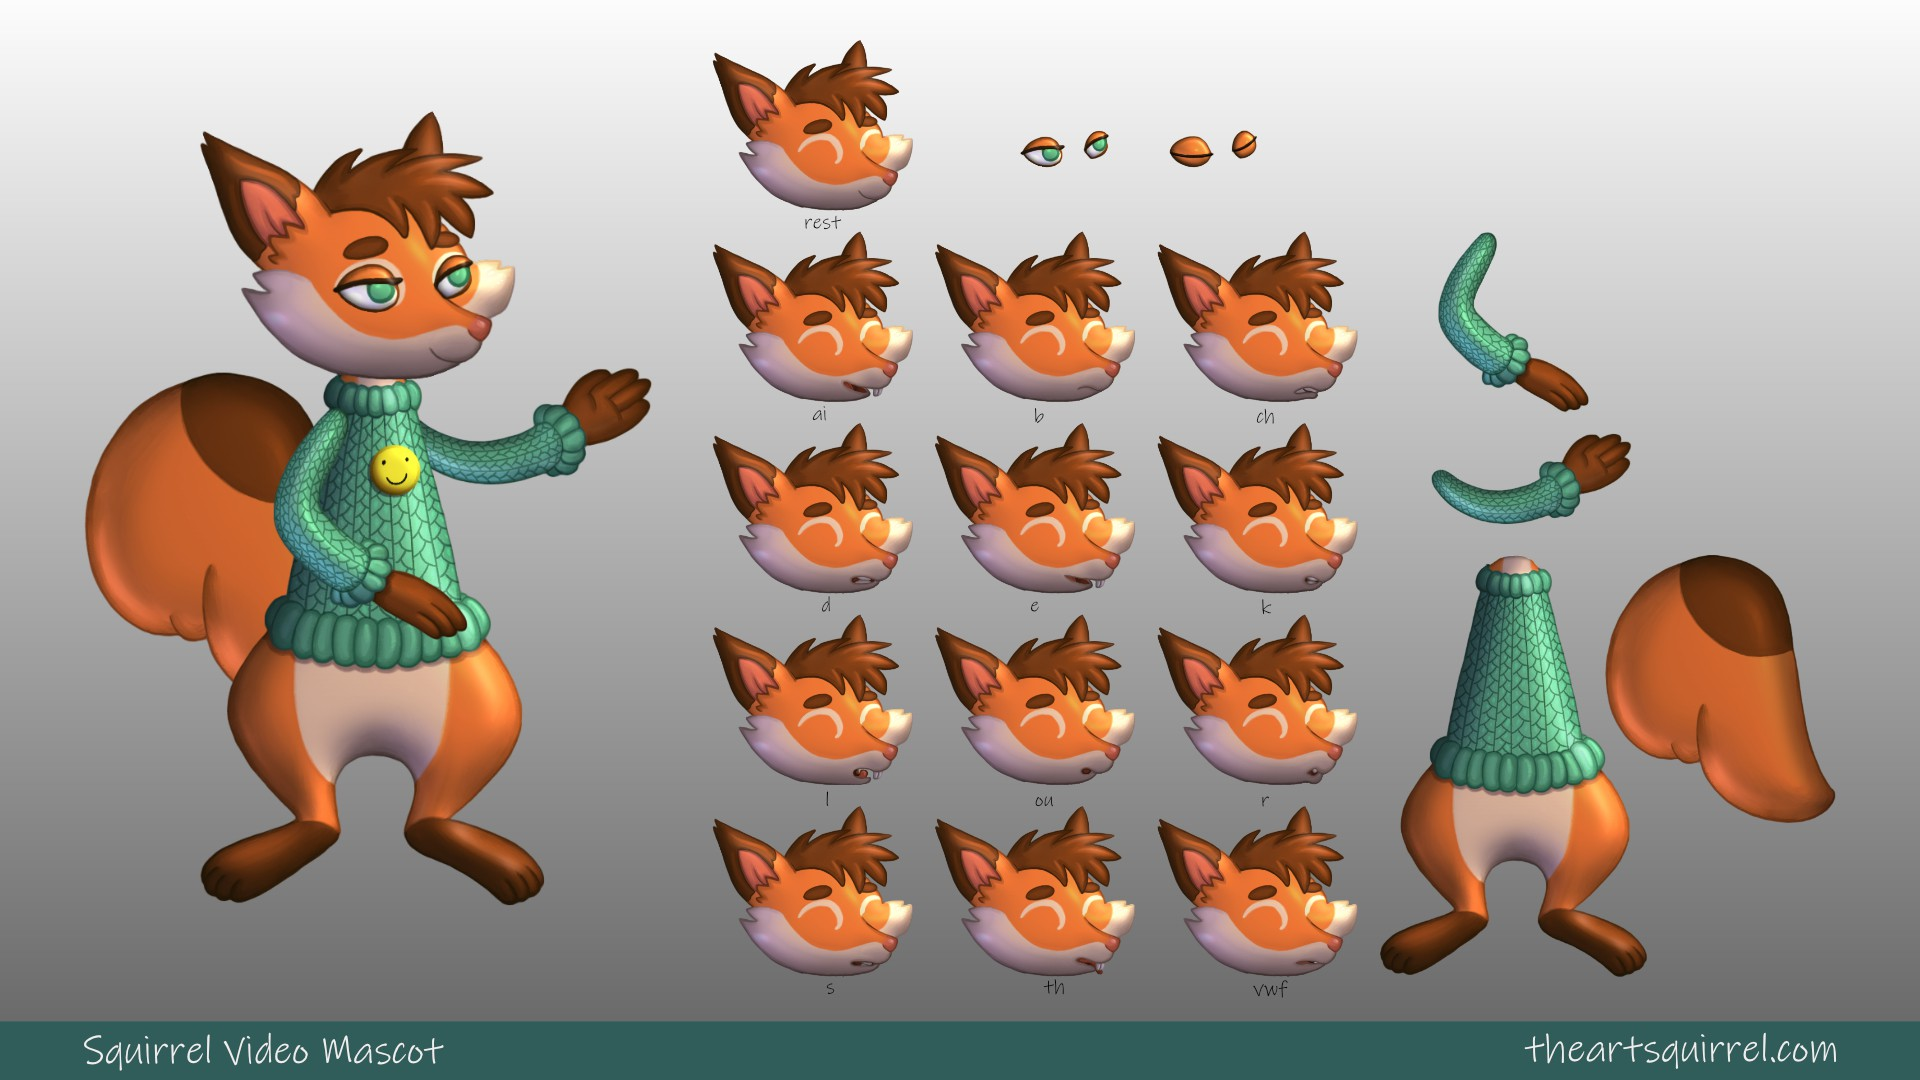 Squirrel VTuber 2d mascot